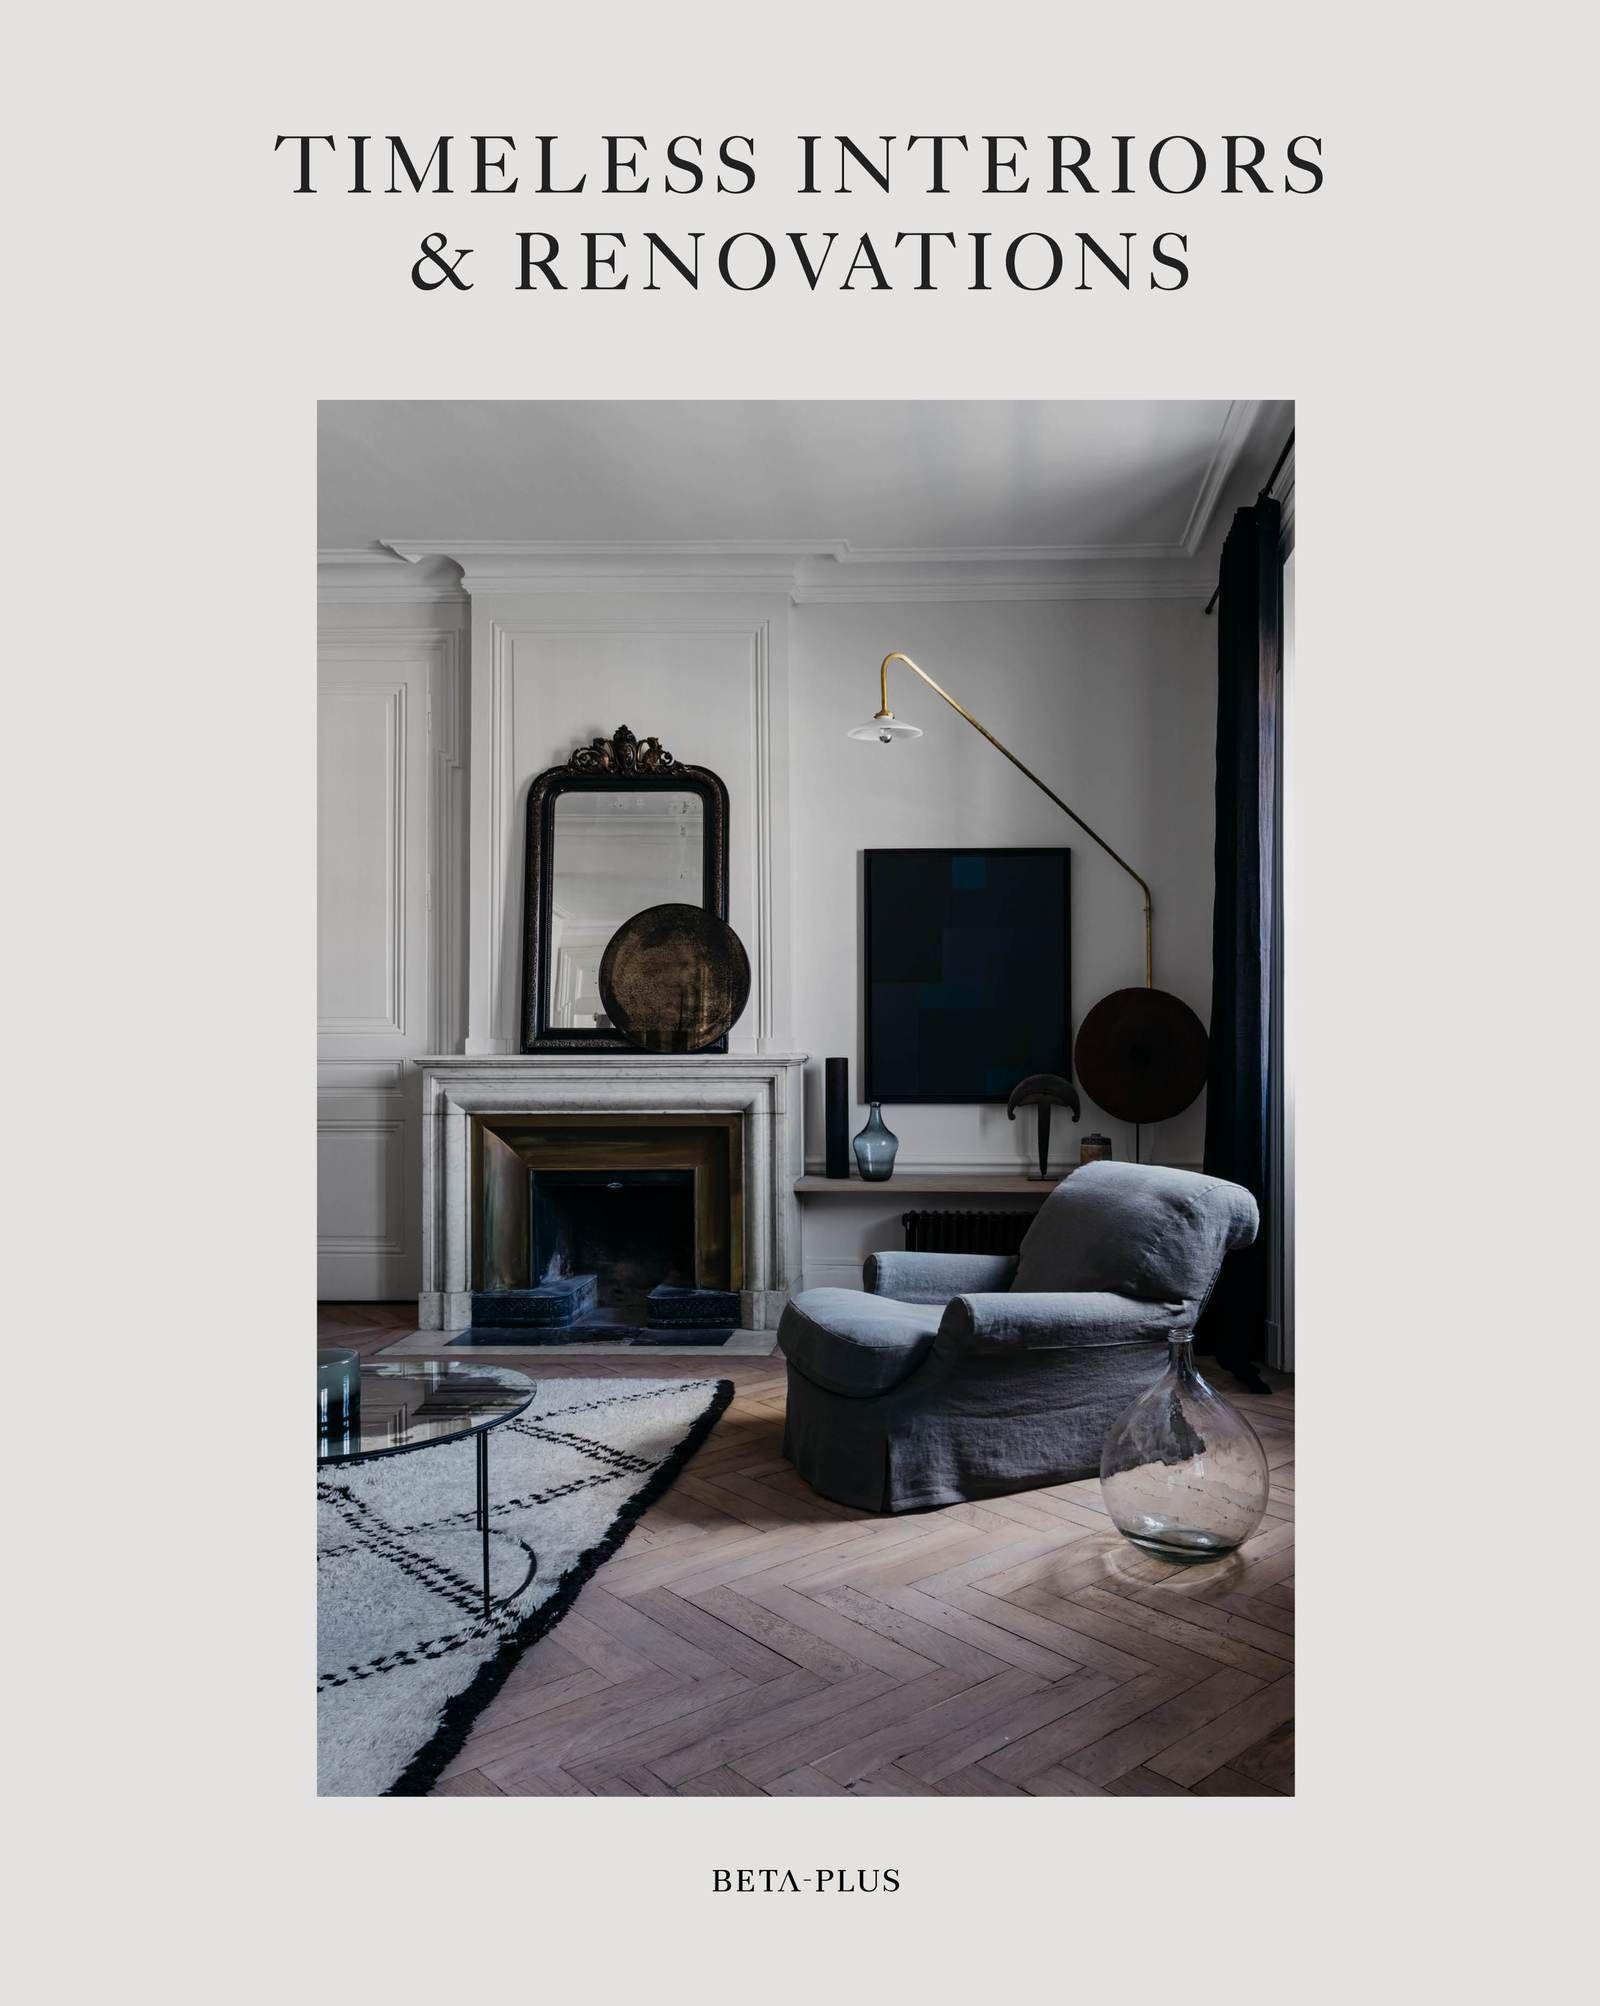 Timeless Interiors & Renovations in 2020 Interior, Paris